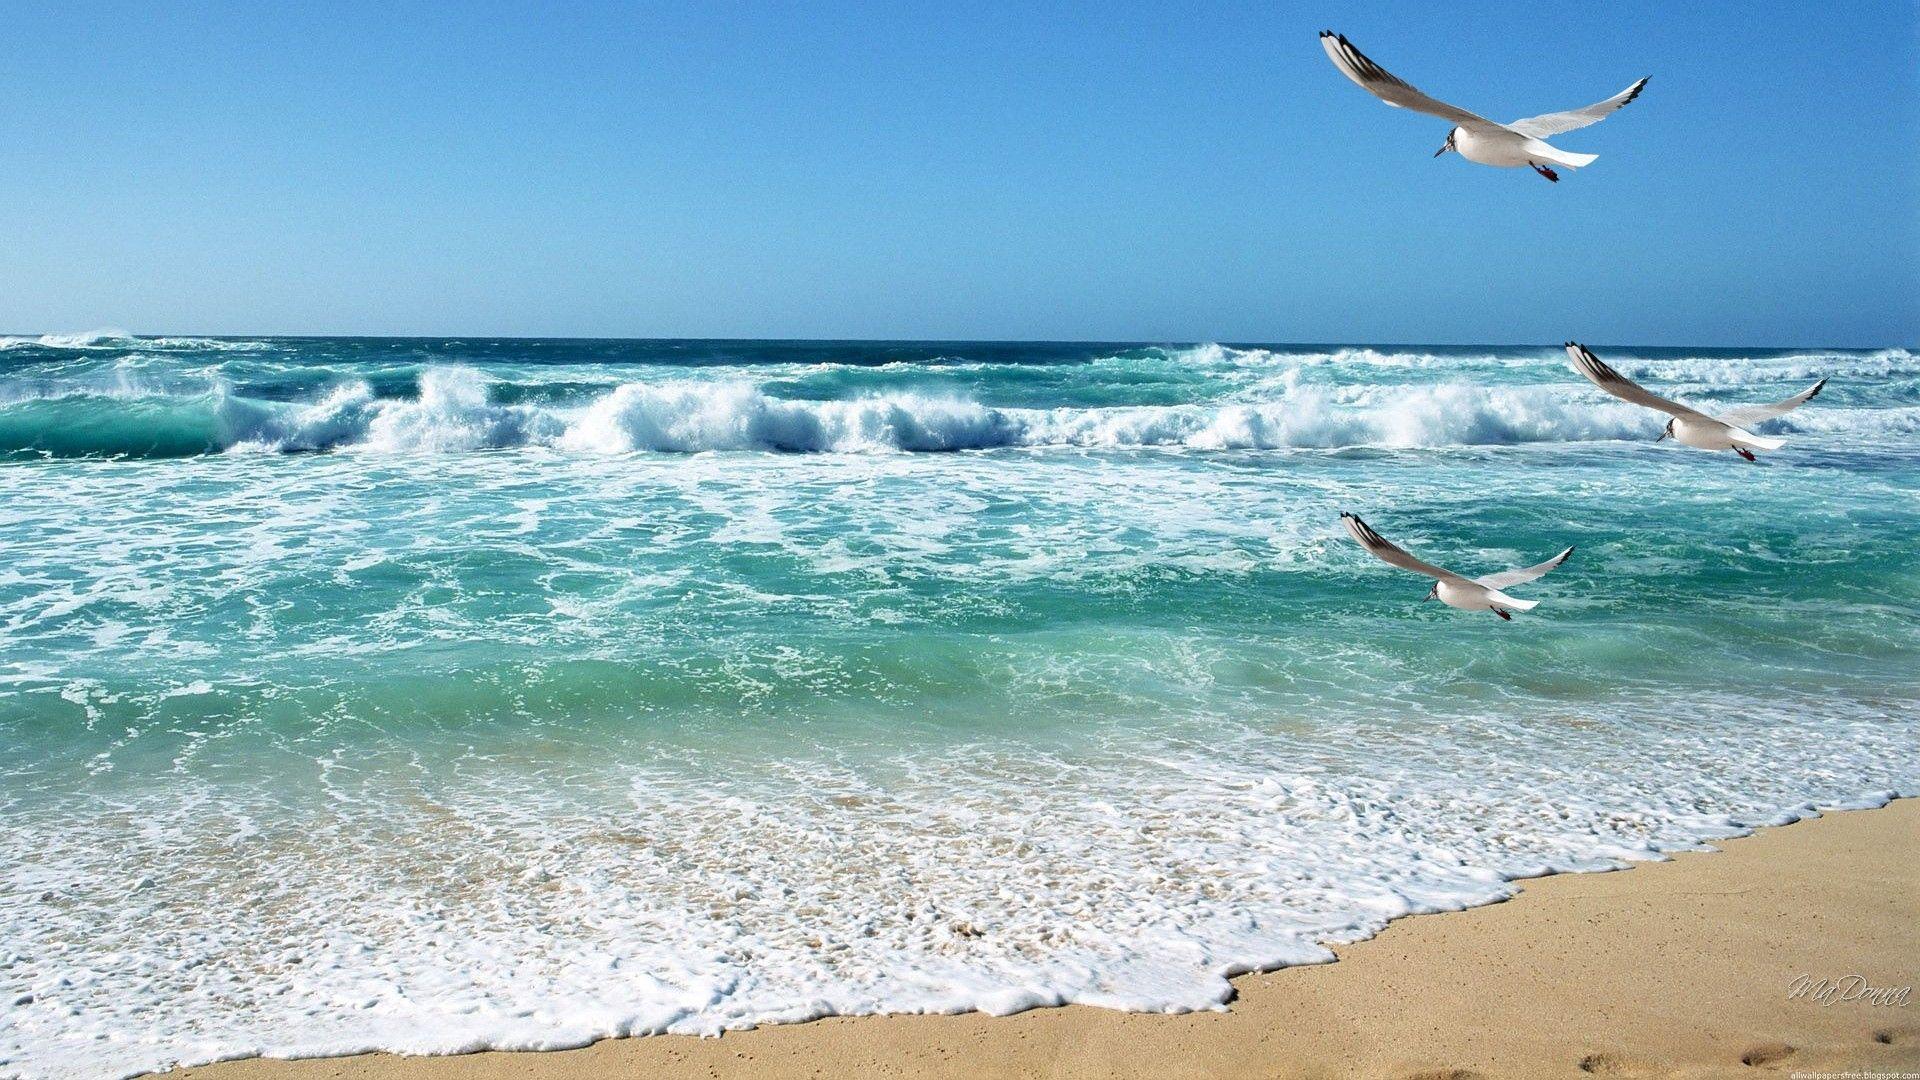 Beach Calming Waves Seashore Bay Ocean Birds Sky Seagulls Sand Serene Warm Tranquil Vacation Sea Calm Wallpaper Ocean Landscape Beach Landscape Sea Photography Wallpaper beach waves sea sand coast